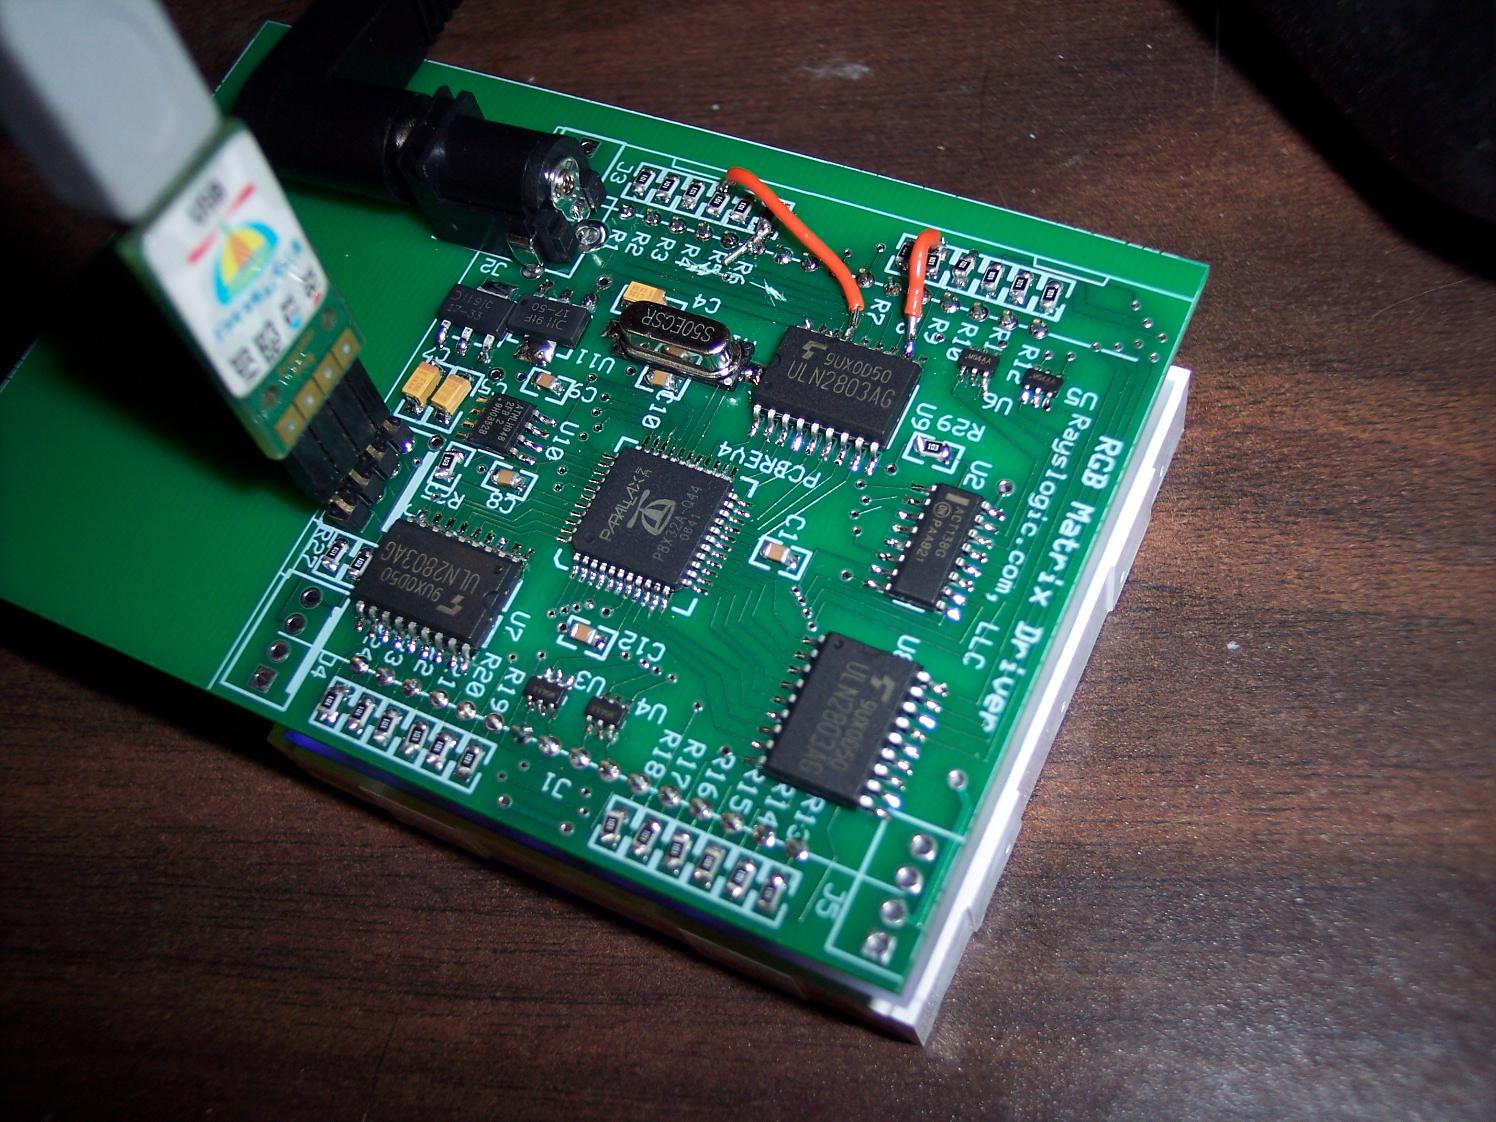 Prop Powered 8x8xrgb Led Matrix Parallax Forums First Step Into Programming Propeller Propmatrixdriver